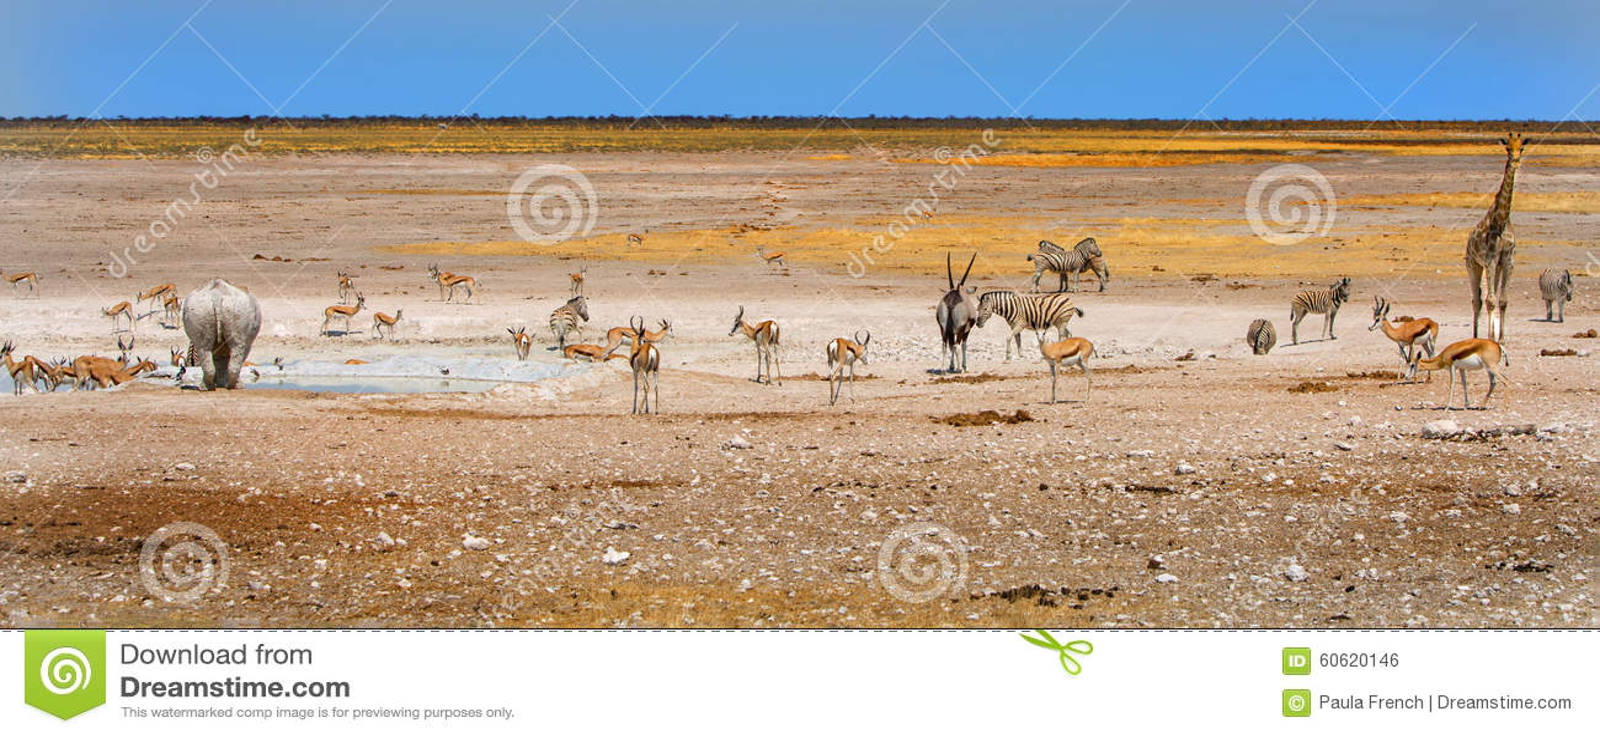 A variety of animals around a waterhole in Etosha National Park